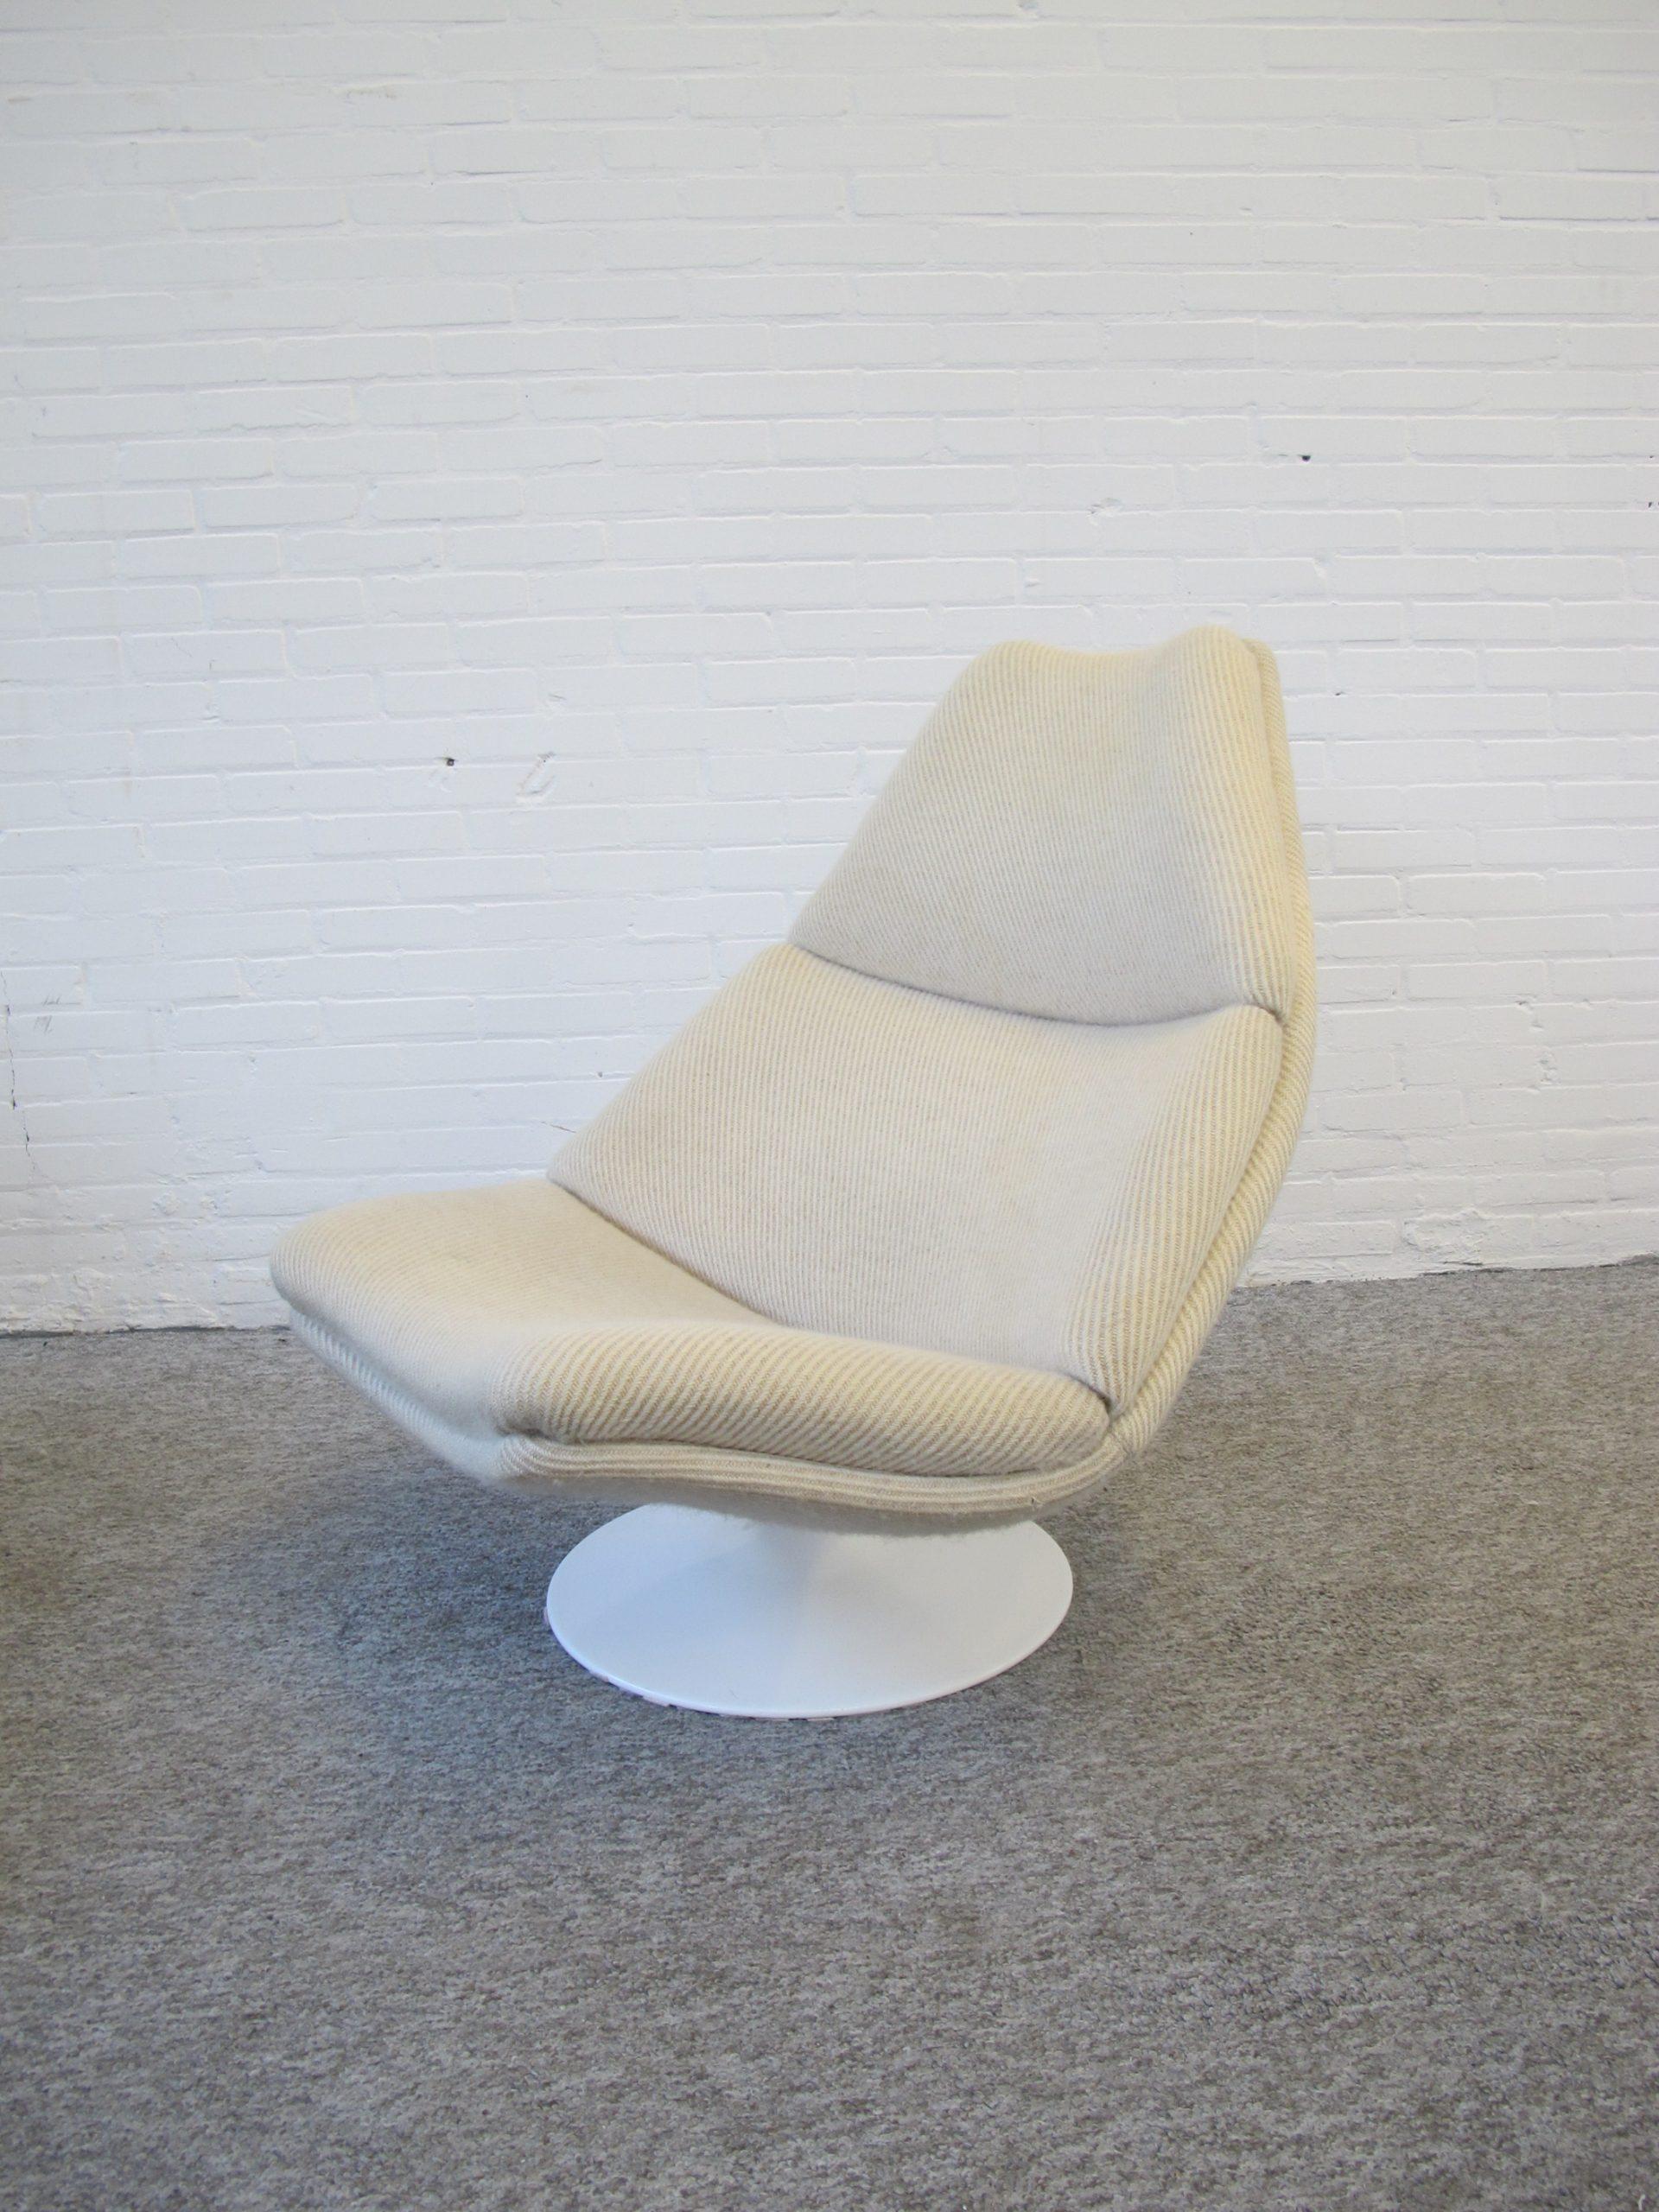 Lounge fauteuil lounge chair F510 Geoffrey Harcourt Artifort vintage midcentury